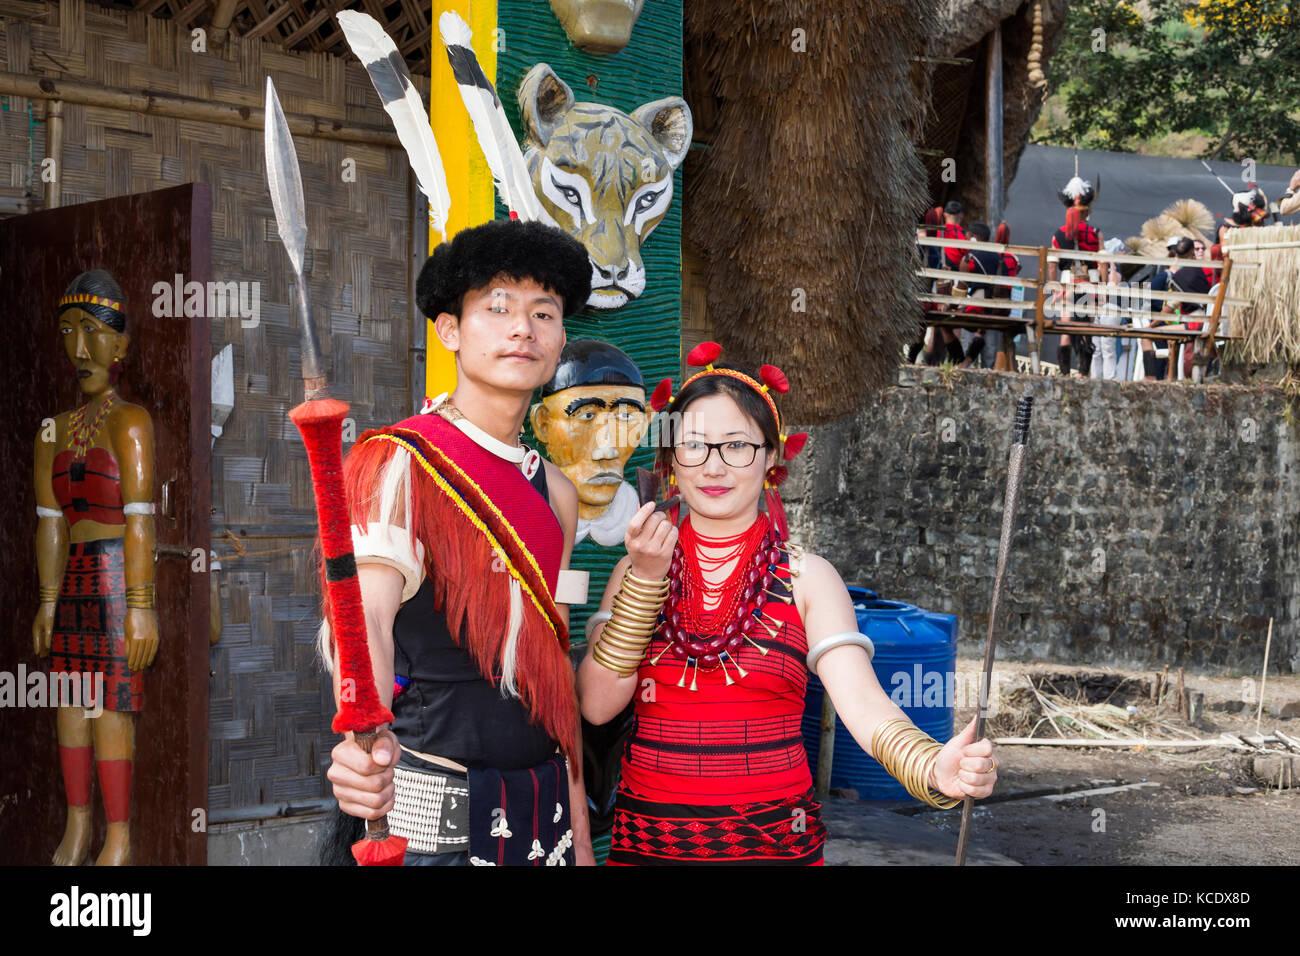 Couple of Naga tribal people in traditional clothing, Kisima Nagaland Hornbill festival, Kohima, Nagaland, India - Stock Image